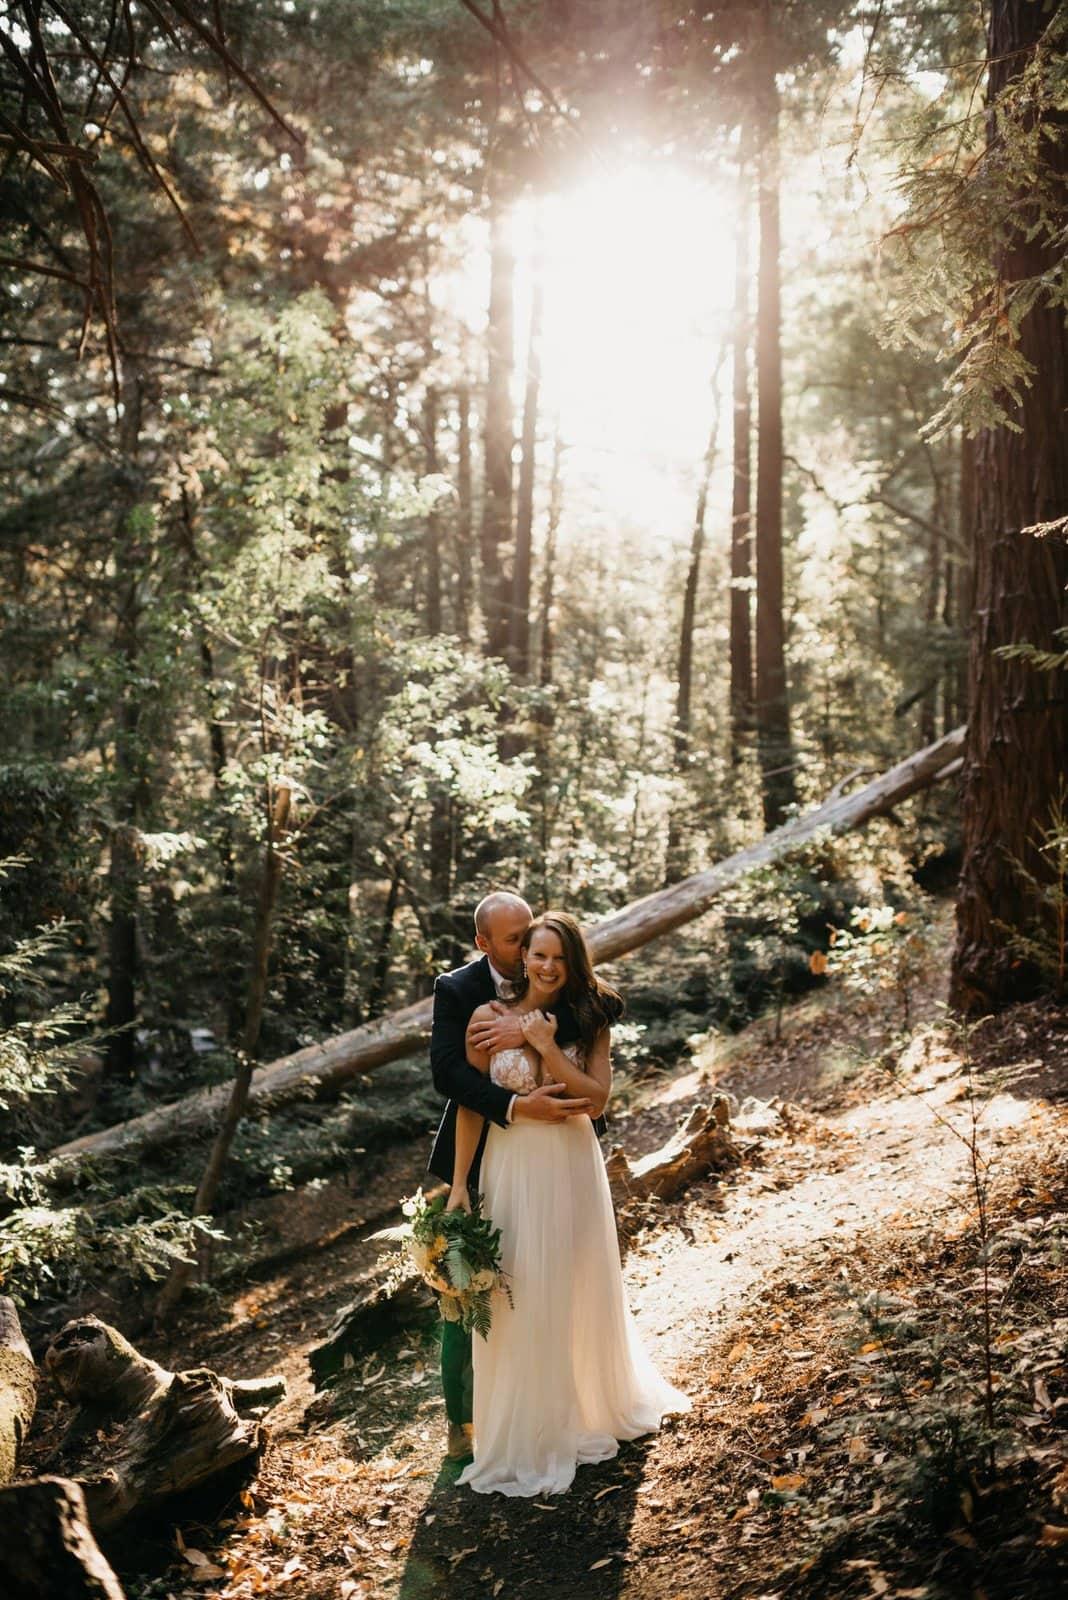 bridal portraits for elopement in redwoods.